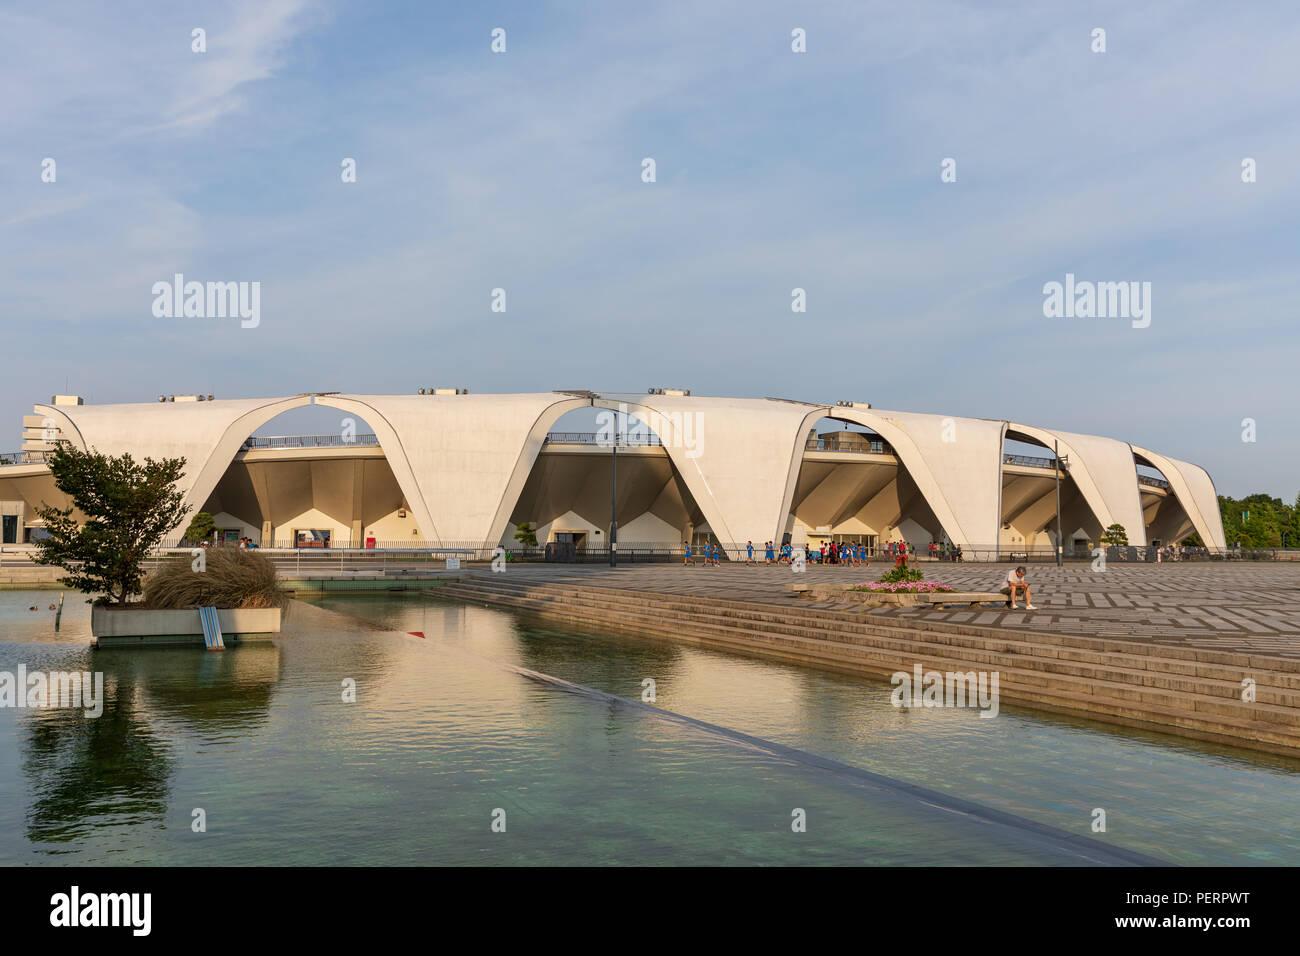 Komazawa Olympic Park Stadium (Murata Masachika Architects), built for the 1964 Summer Olympics in Tokyo, Japan Stock Photo